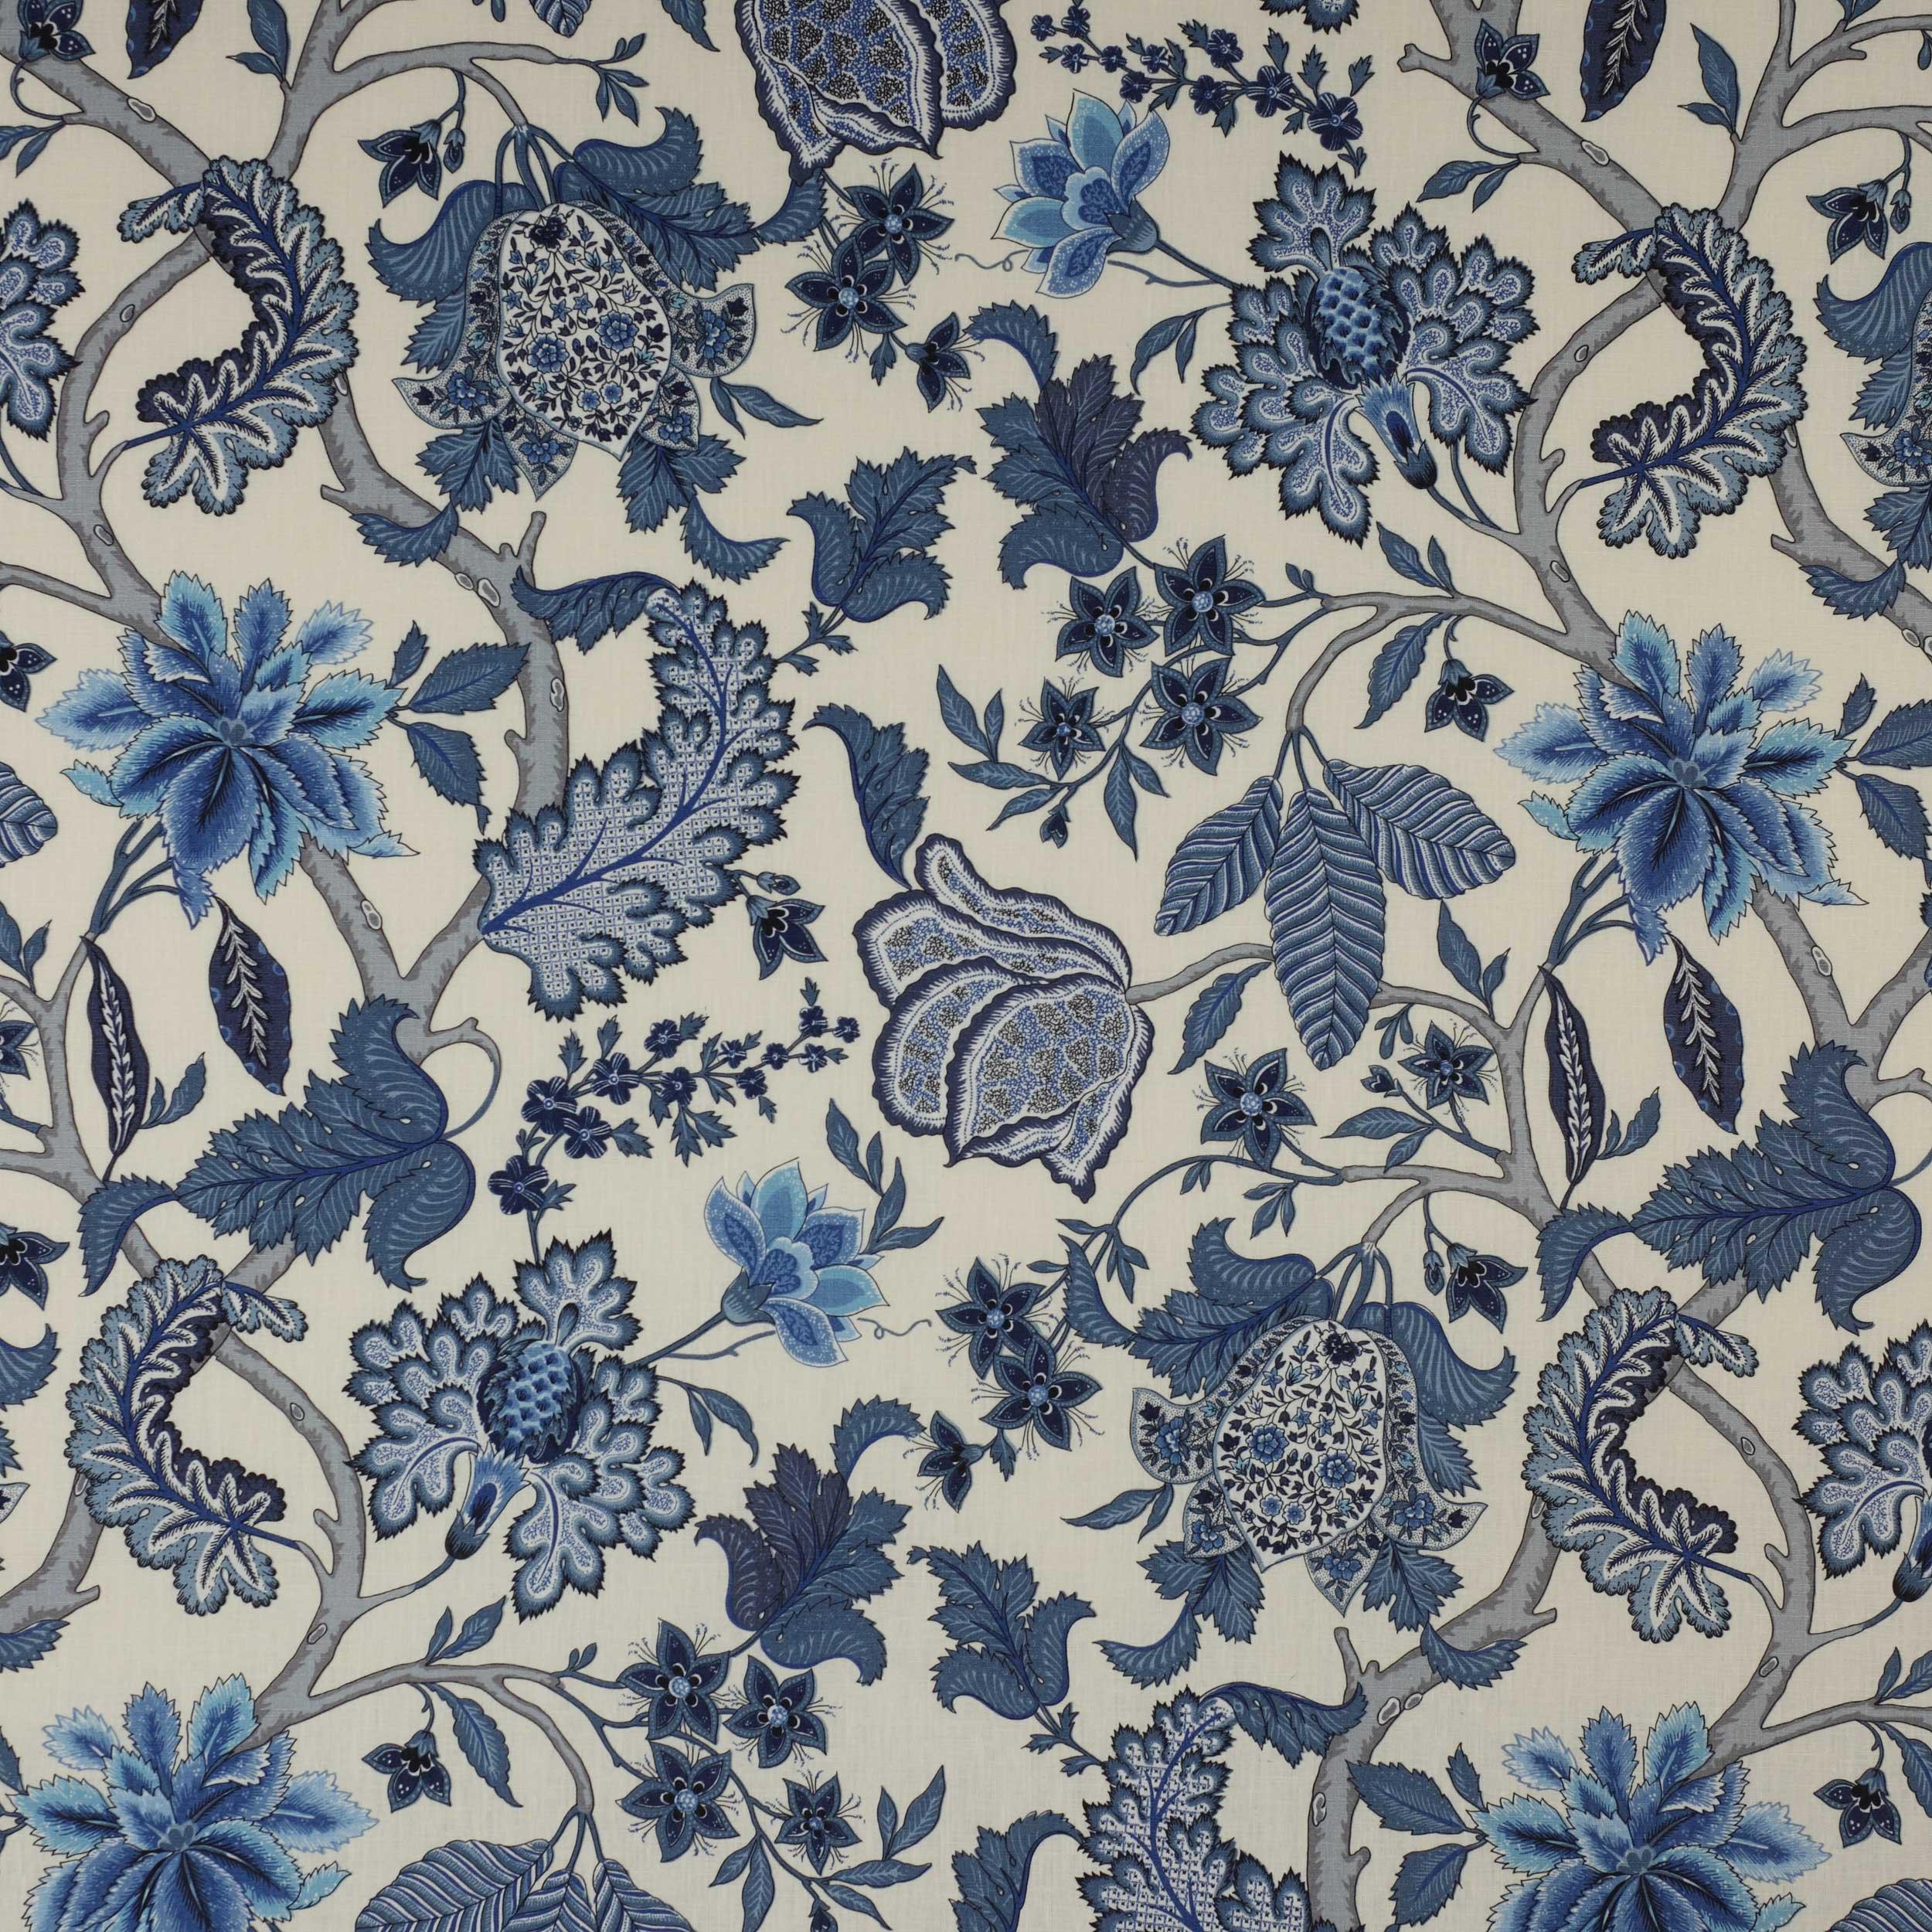 Bagatelle-wallpaper-wp5803793